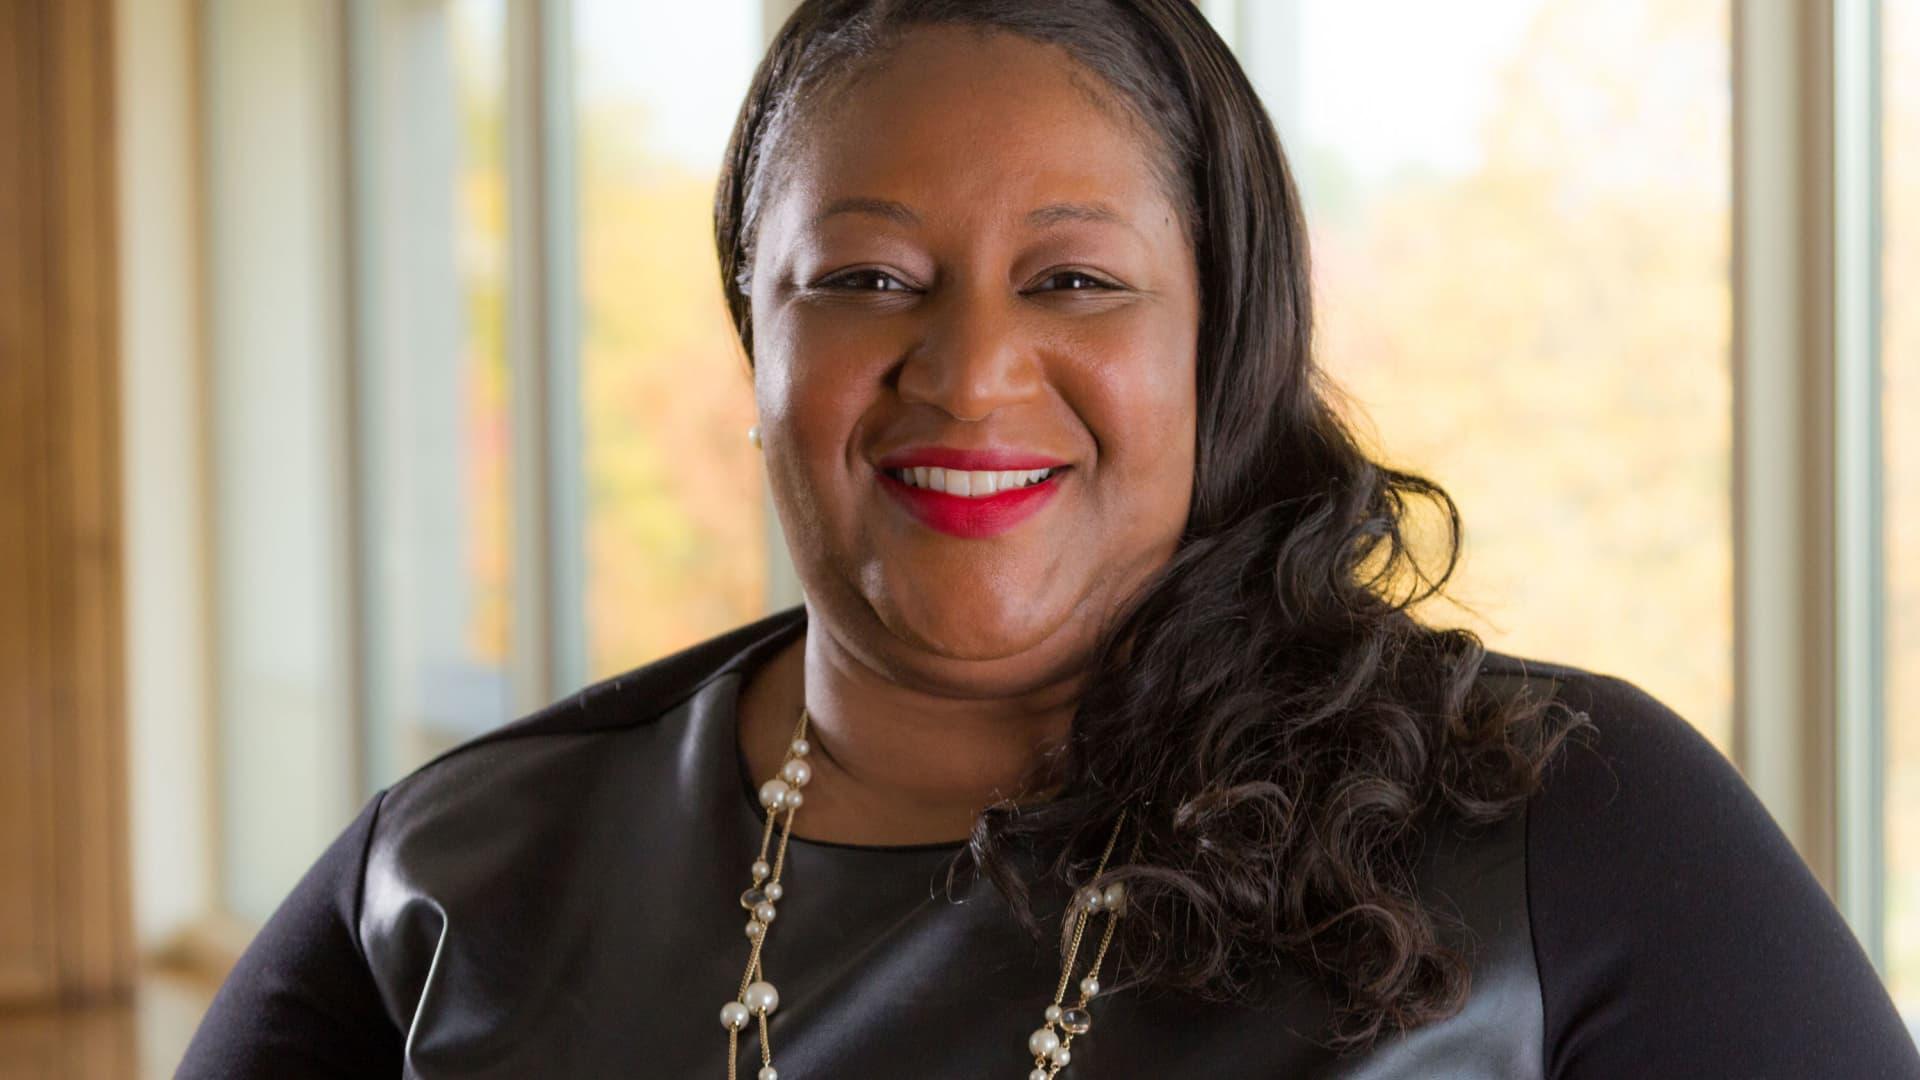 Sandra Richards, Head of Morgan Stanley Global Sports & Entertainment